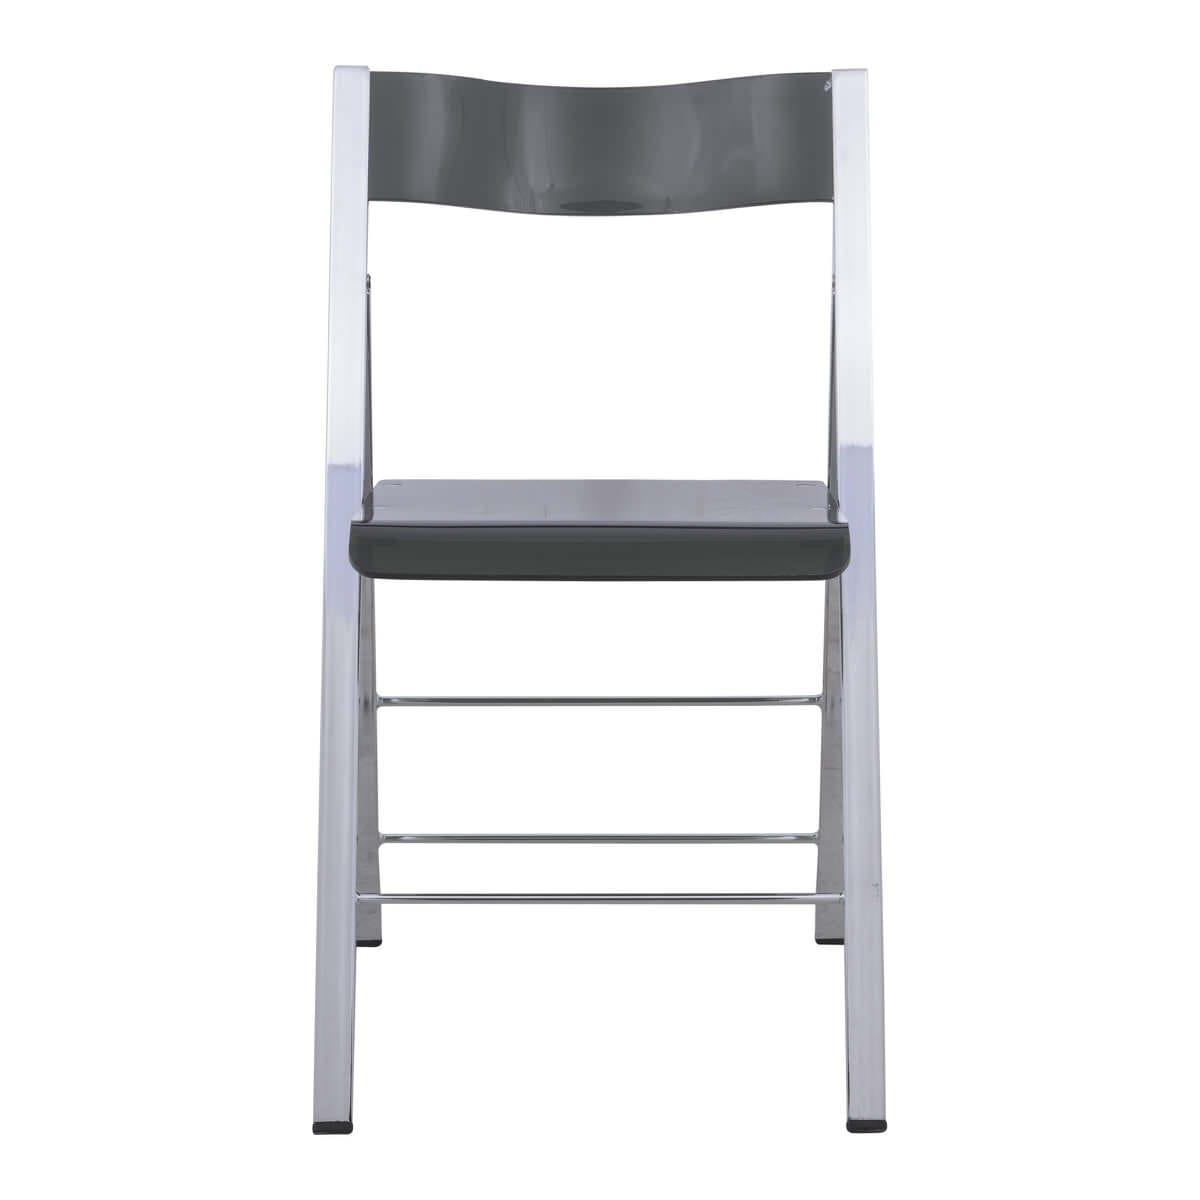 Remarkable Menno Modern Transparent Black Acrylic Folding Chair Set Of 4 By Leisuremod Customarchery Wood Chair Design Ideas Customarcherynet